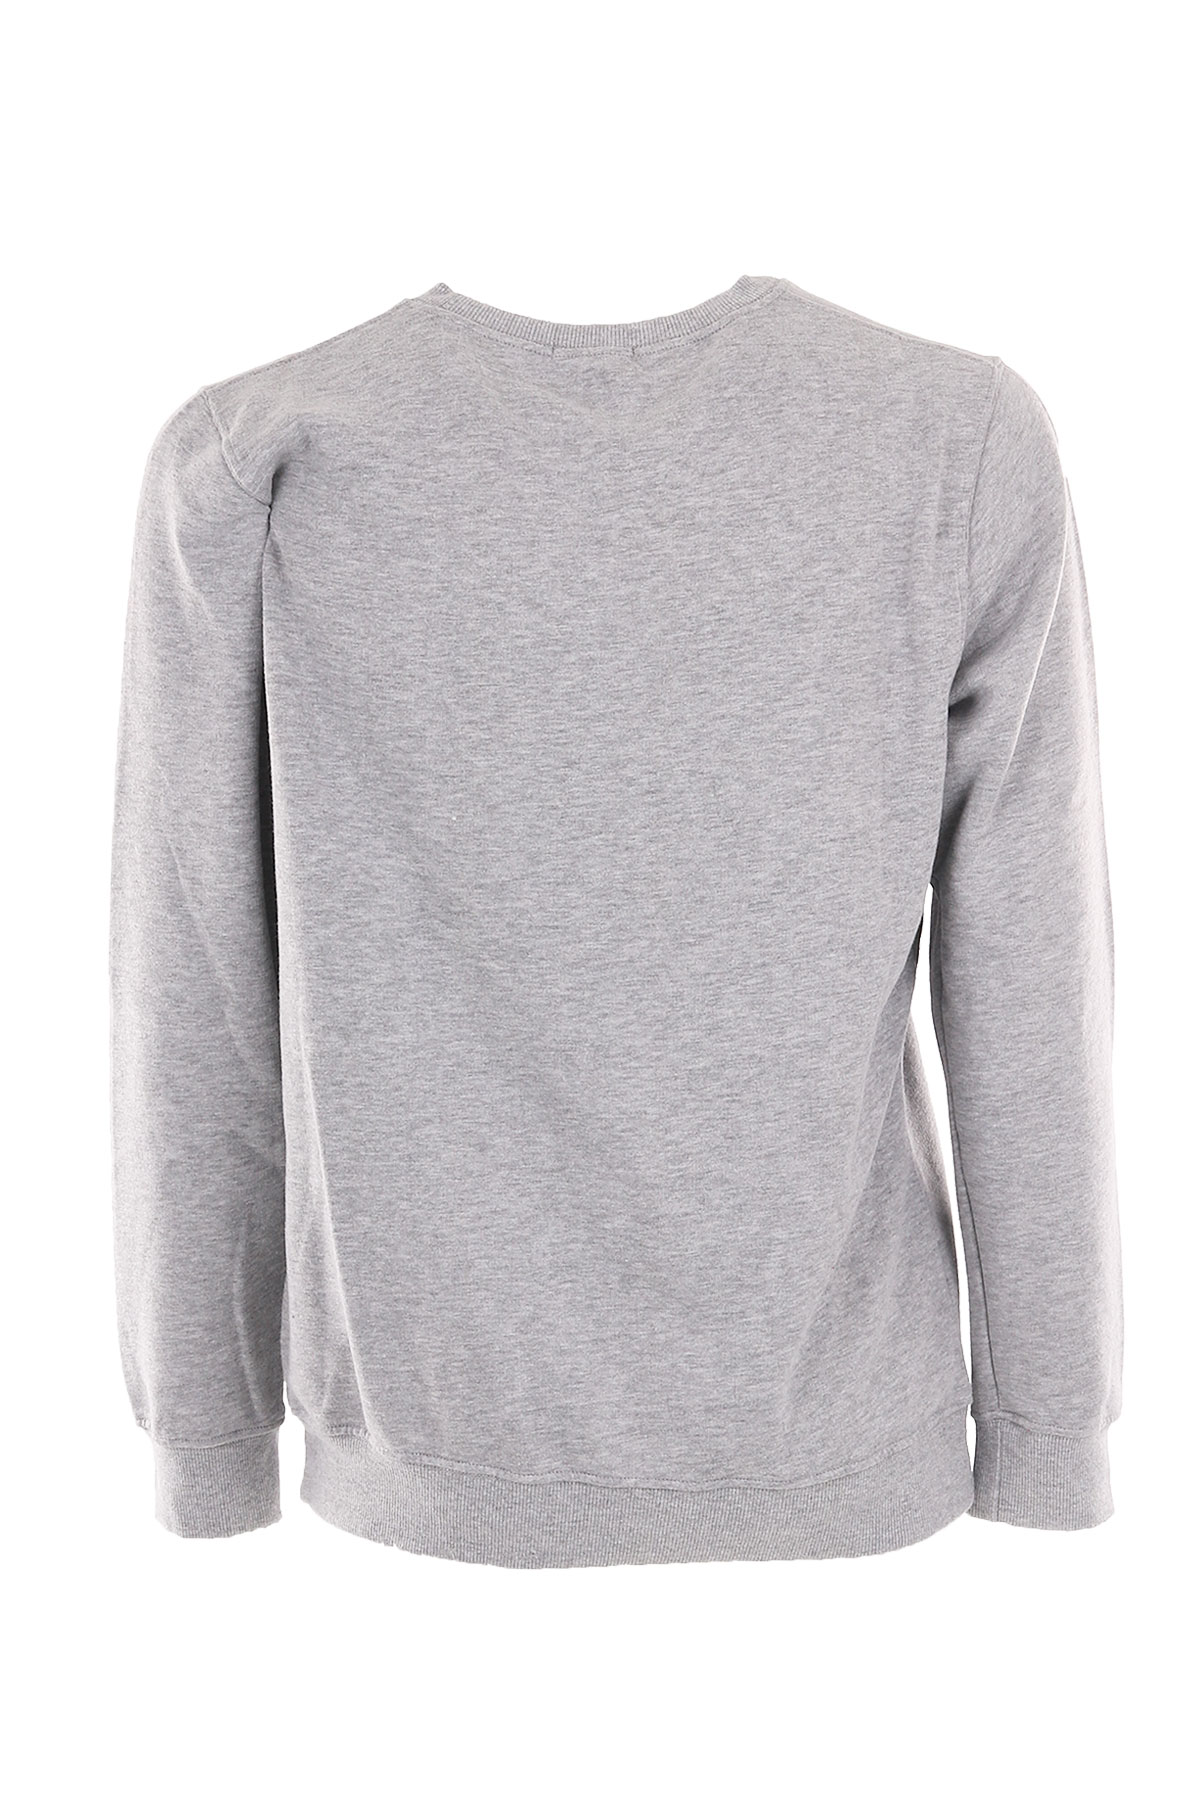 COTTON SWEATSHIRT PEOPLE | Sweatshirts | MO141R15A322009